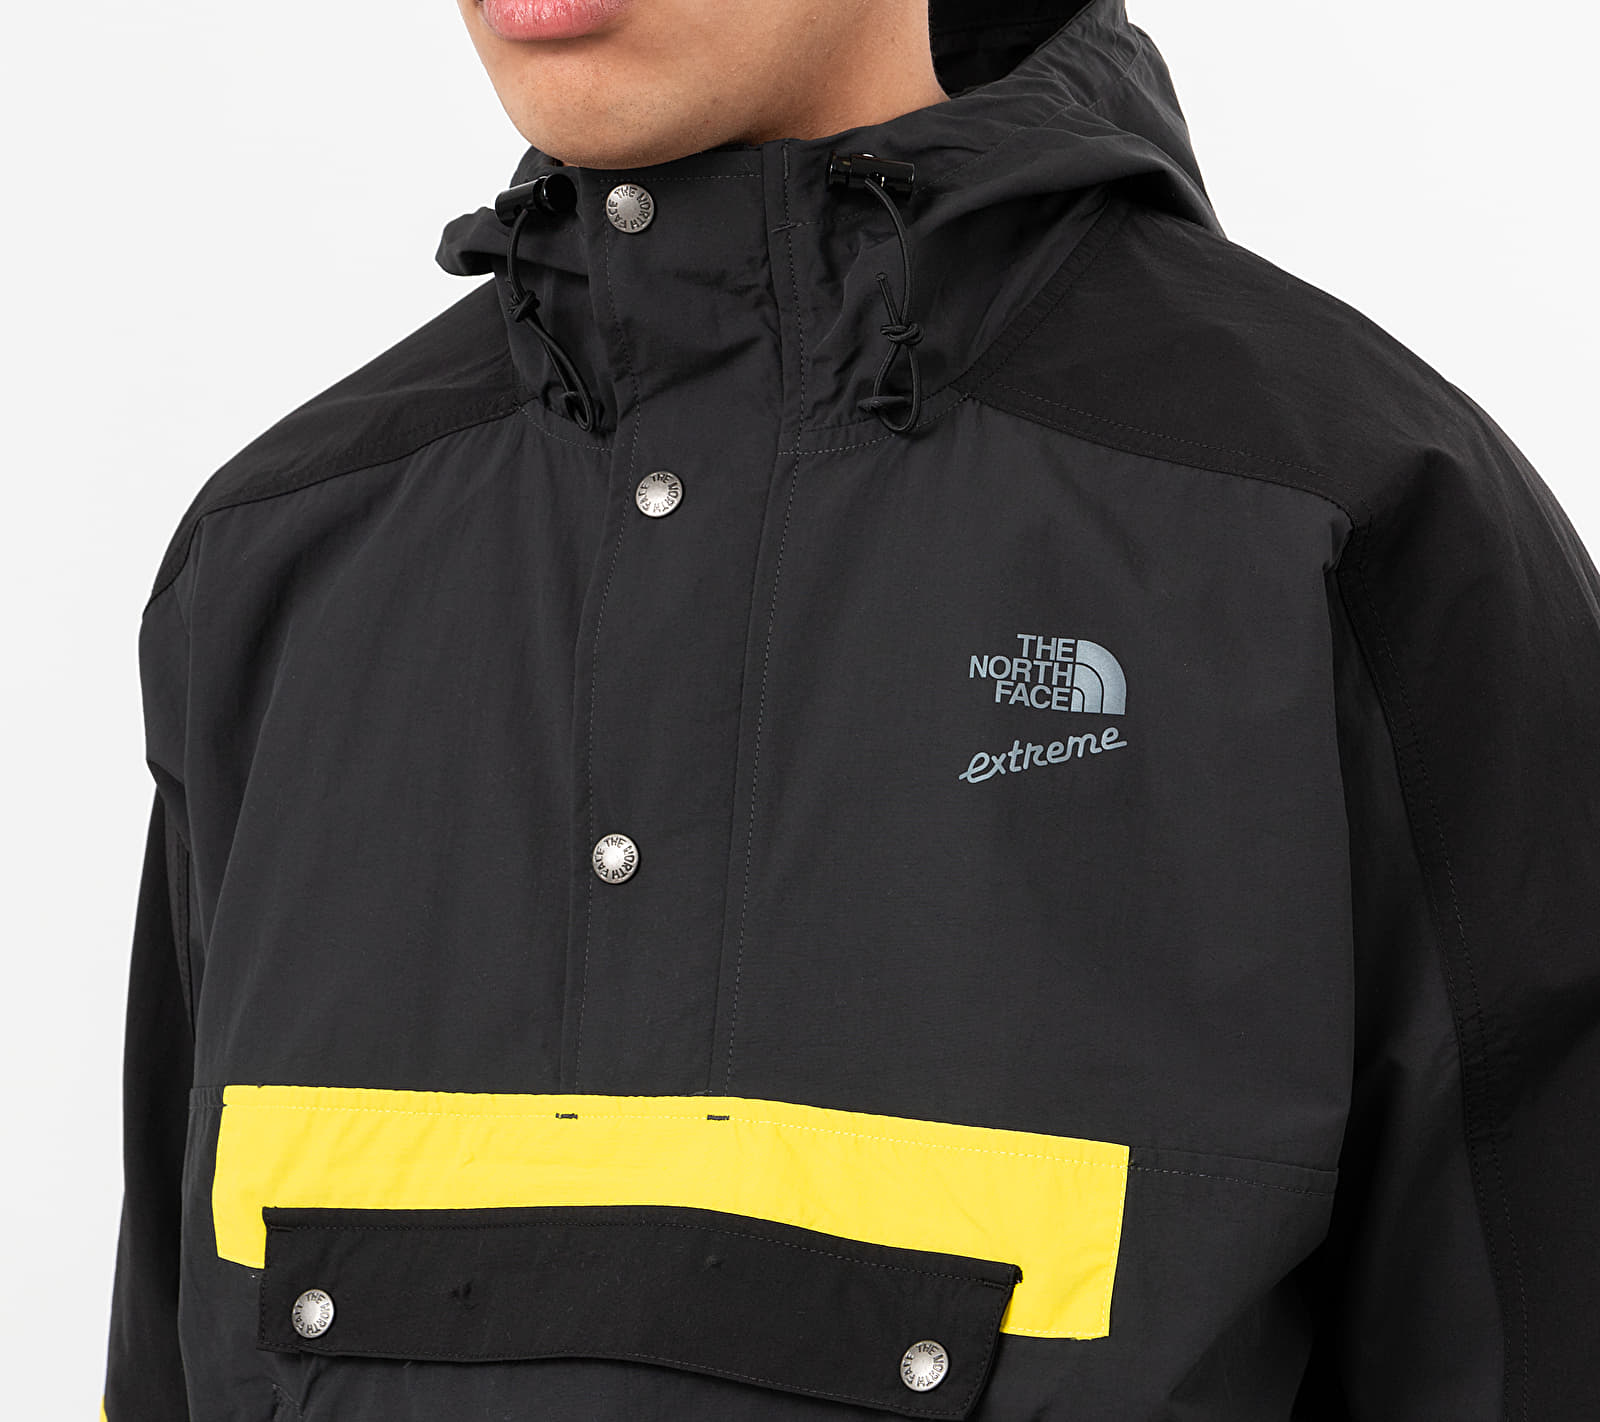 The North Face Extreme Wind Anorak Jacket Asphalt Grey Combo, Gray